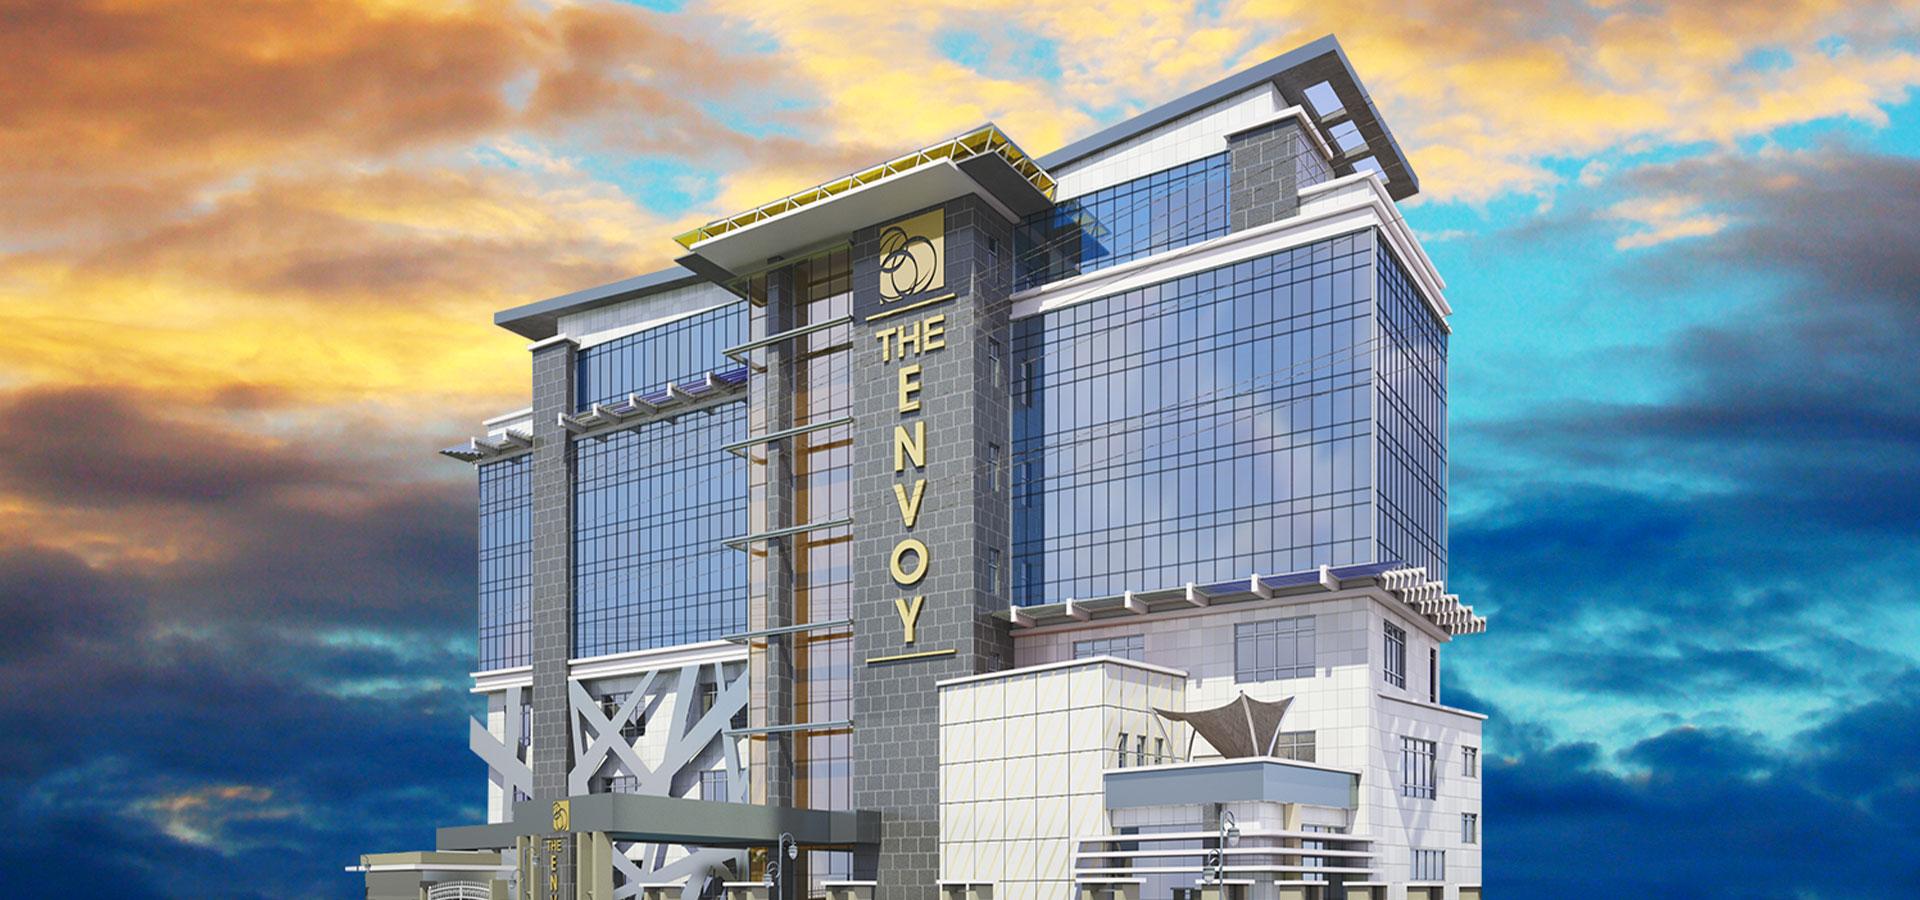 Hotels in Abuja, Envoy Hotel